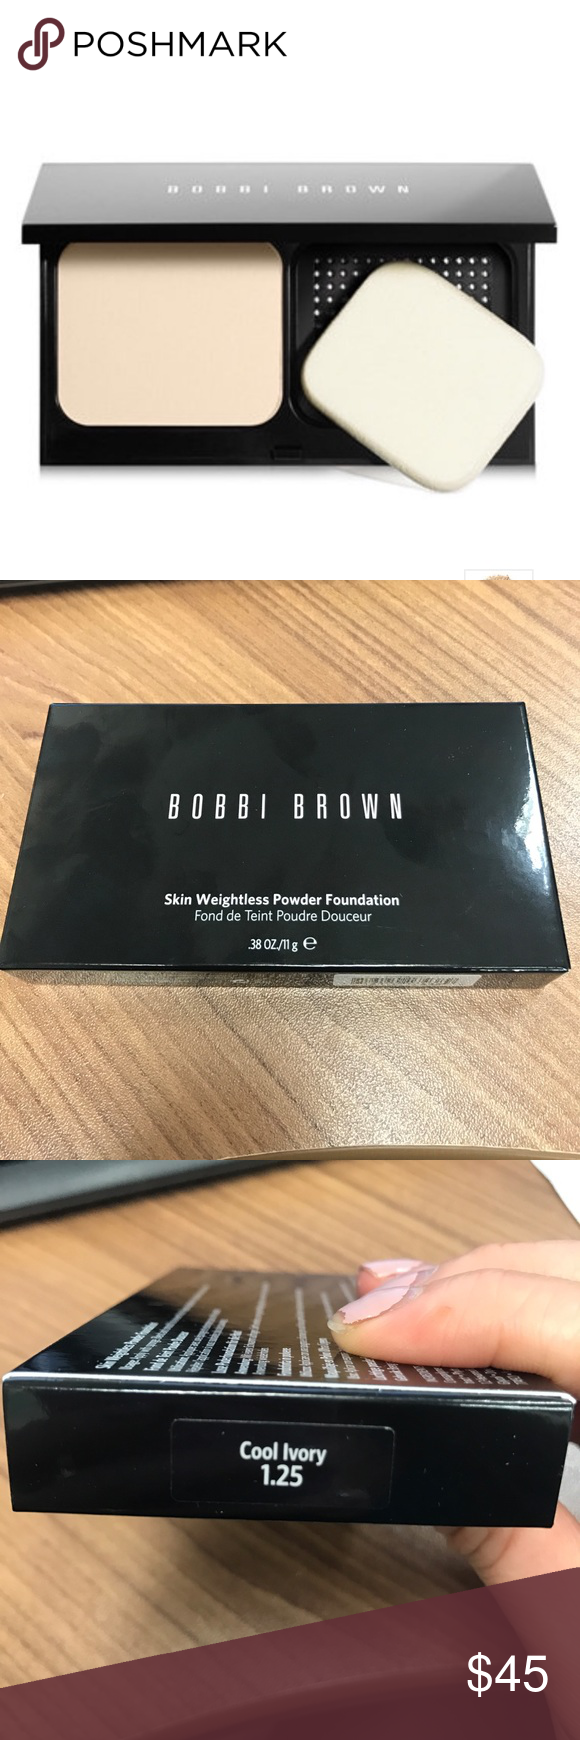 Bobbi Brown Skin Weightless Powder Foundation Brand new! Compact mirror with sponge. Shade: cool ivory Bobbi Brown Makeup Foundation